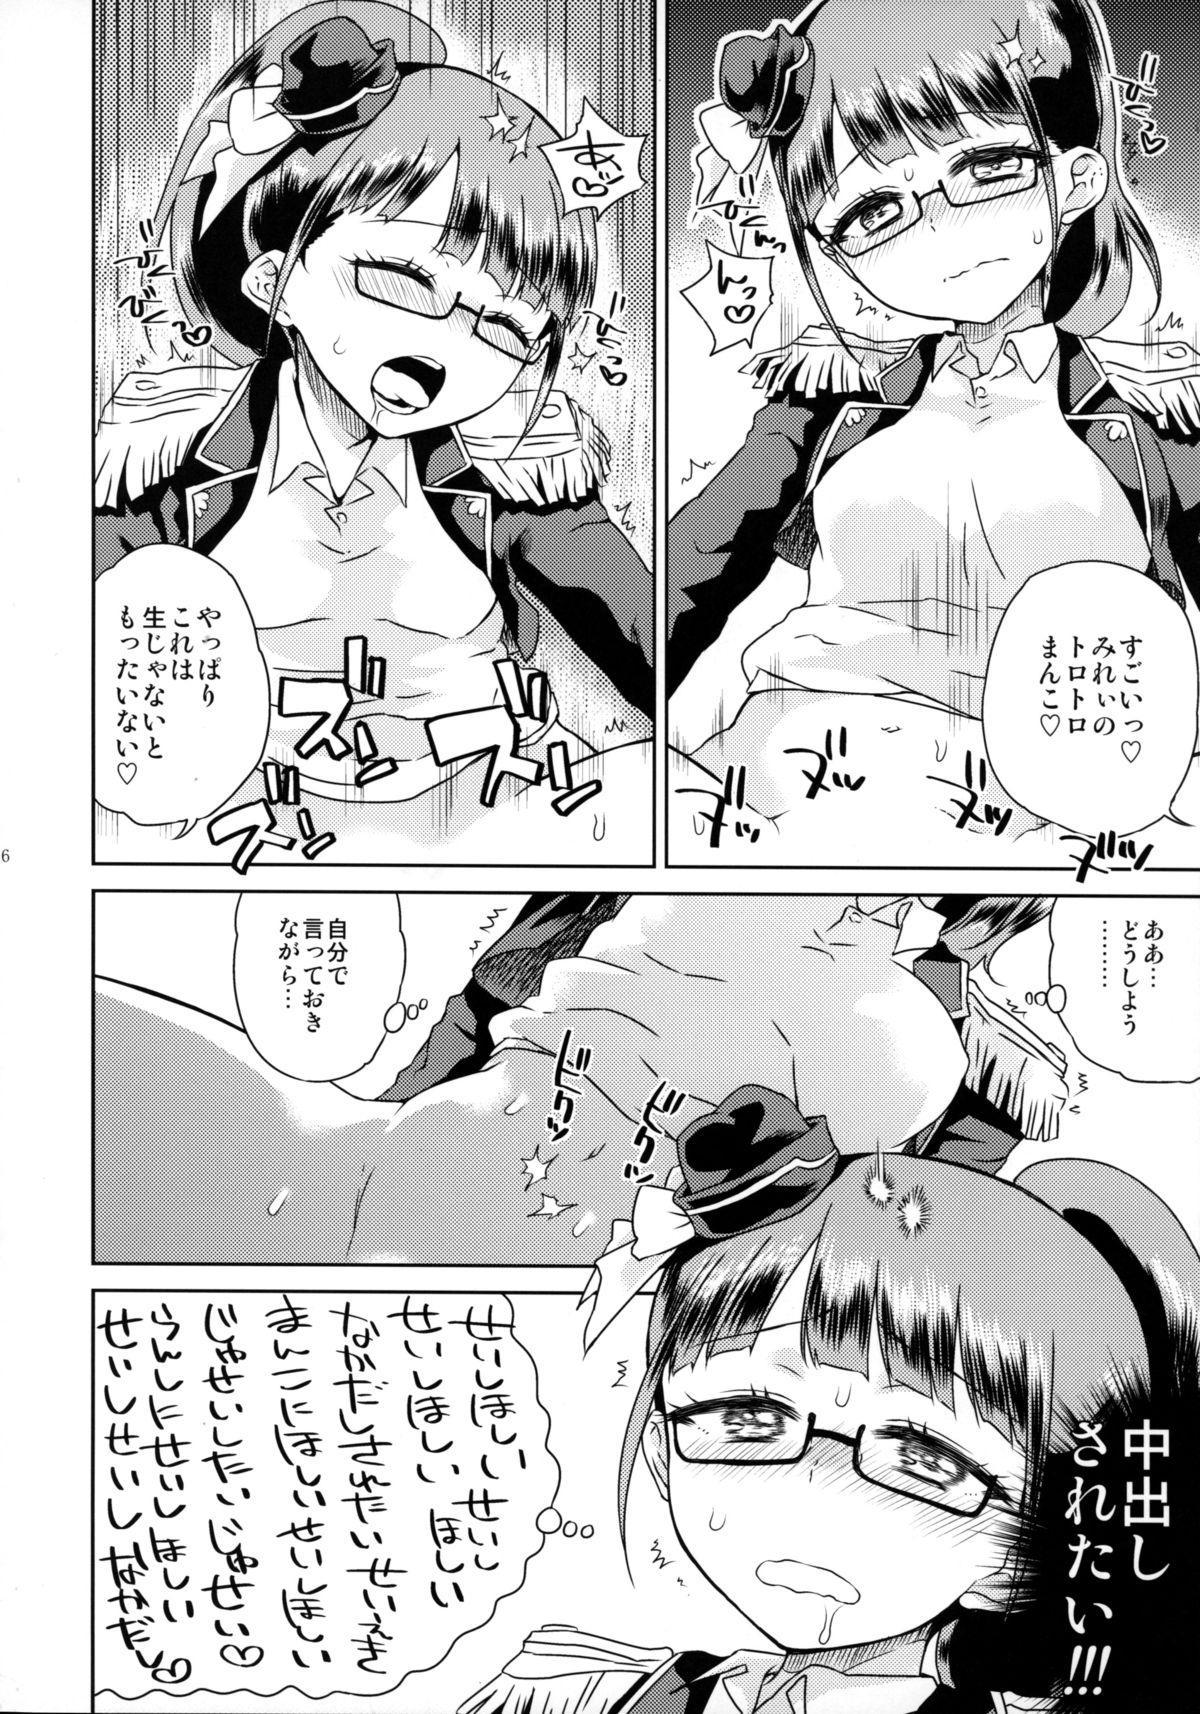 Mirei-chan to Love Love 2 16